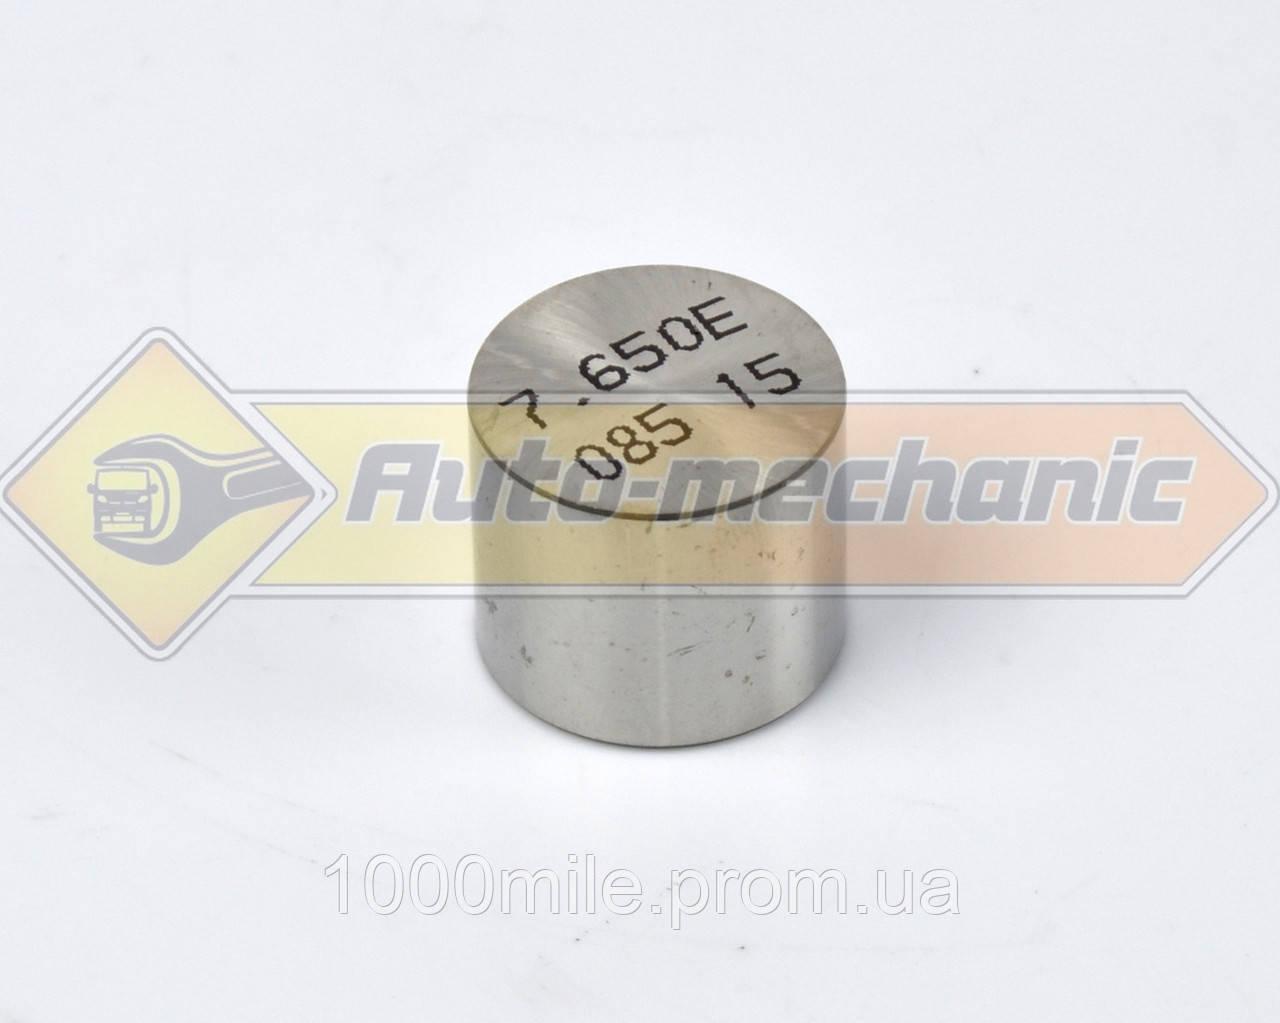 Толкатель клапана (7.650mm) на Renault Master II 98->2010 1.9dTi+1.9dCi — Renault (Оригинал) - 7700102353